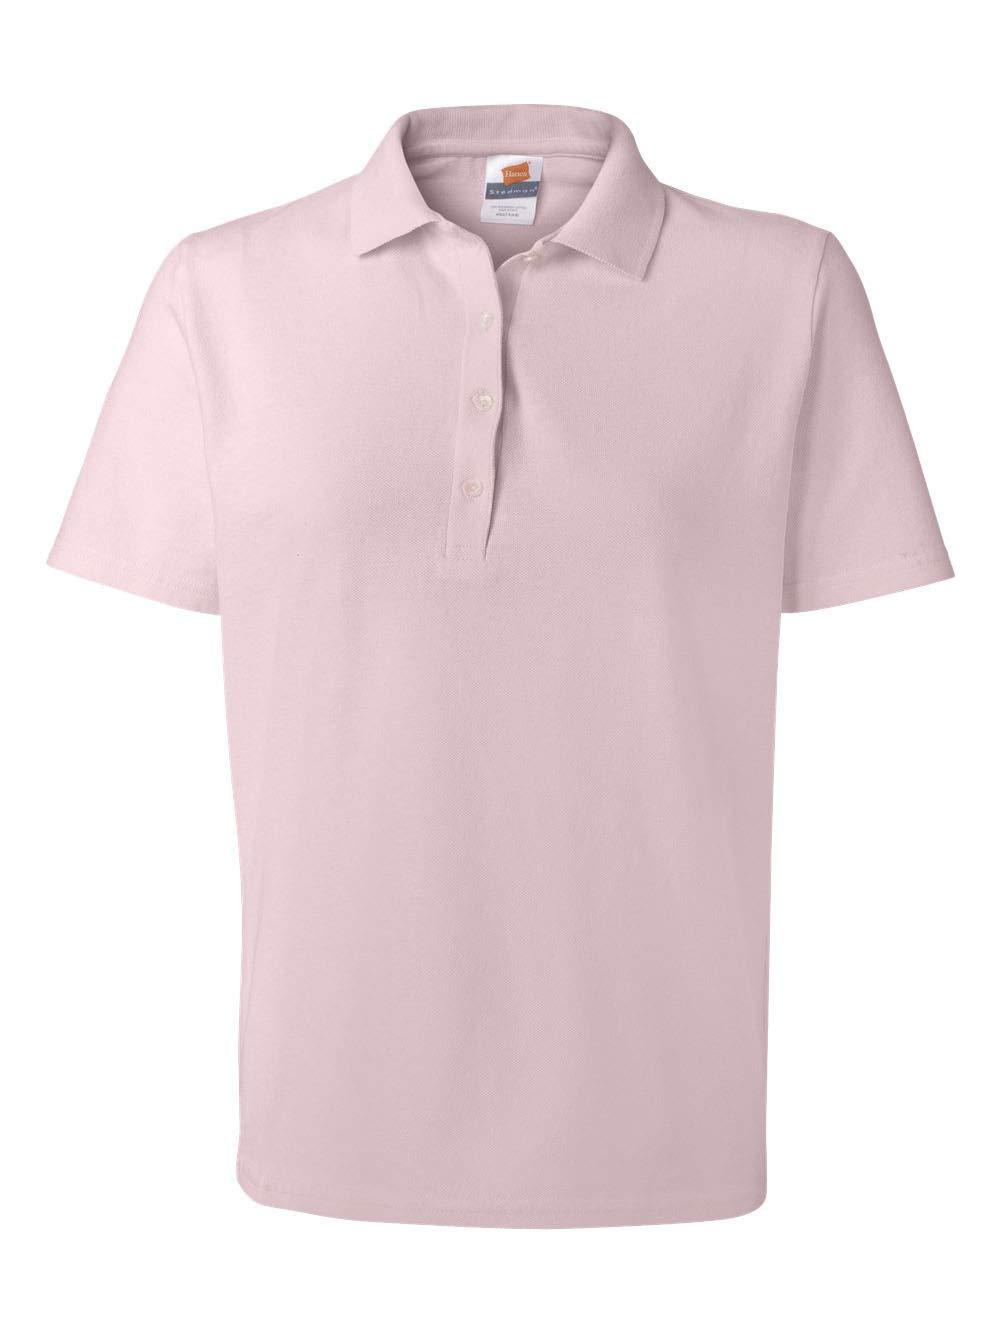 Hanes Womens ComfortSoft Cotton Pique Polo Shirt (035X) -PALE PINK -3XL